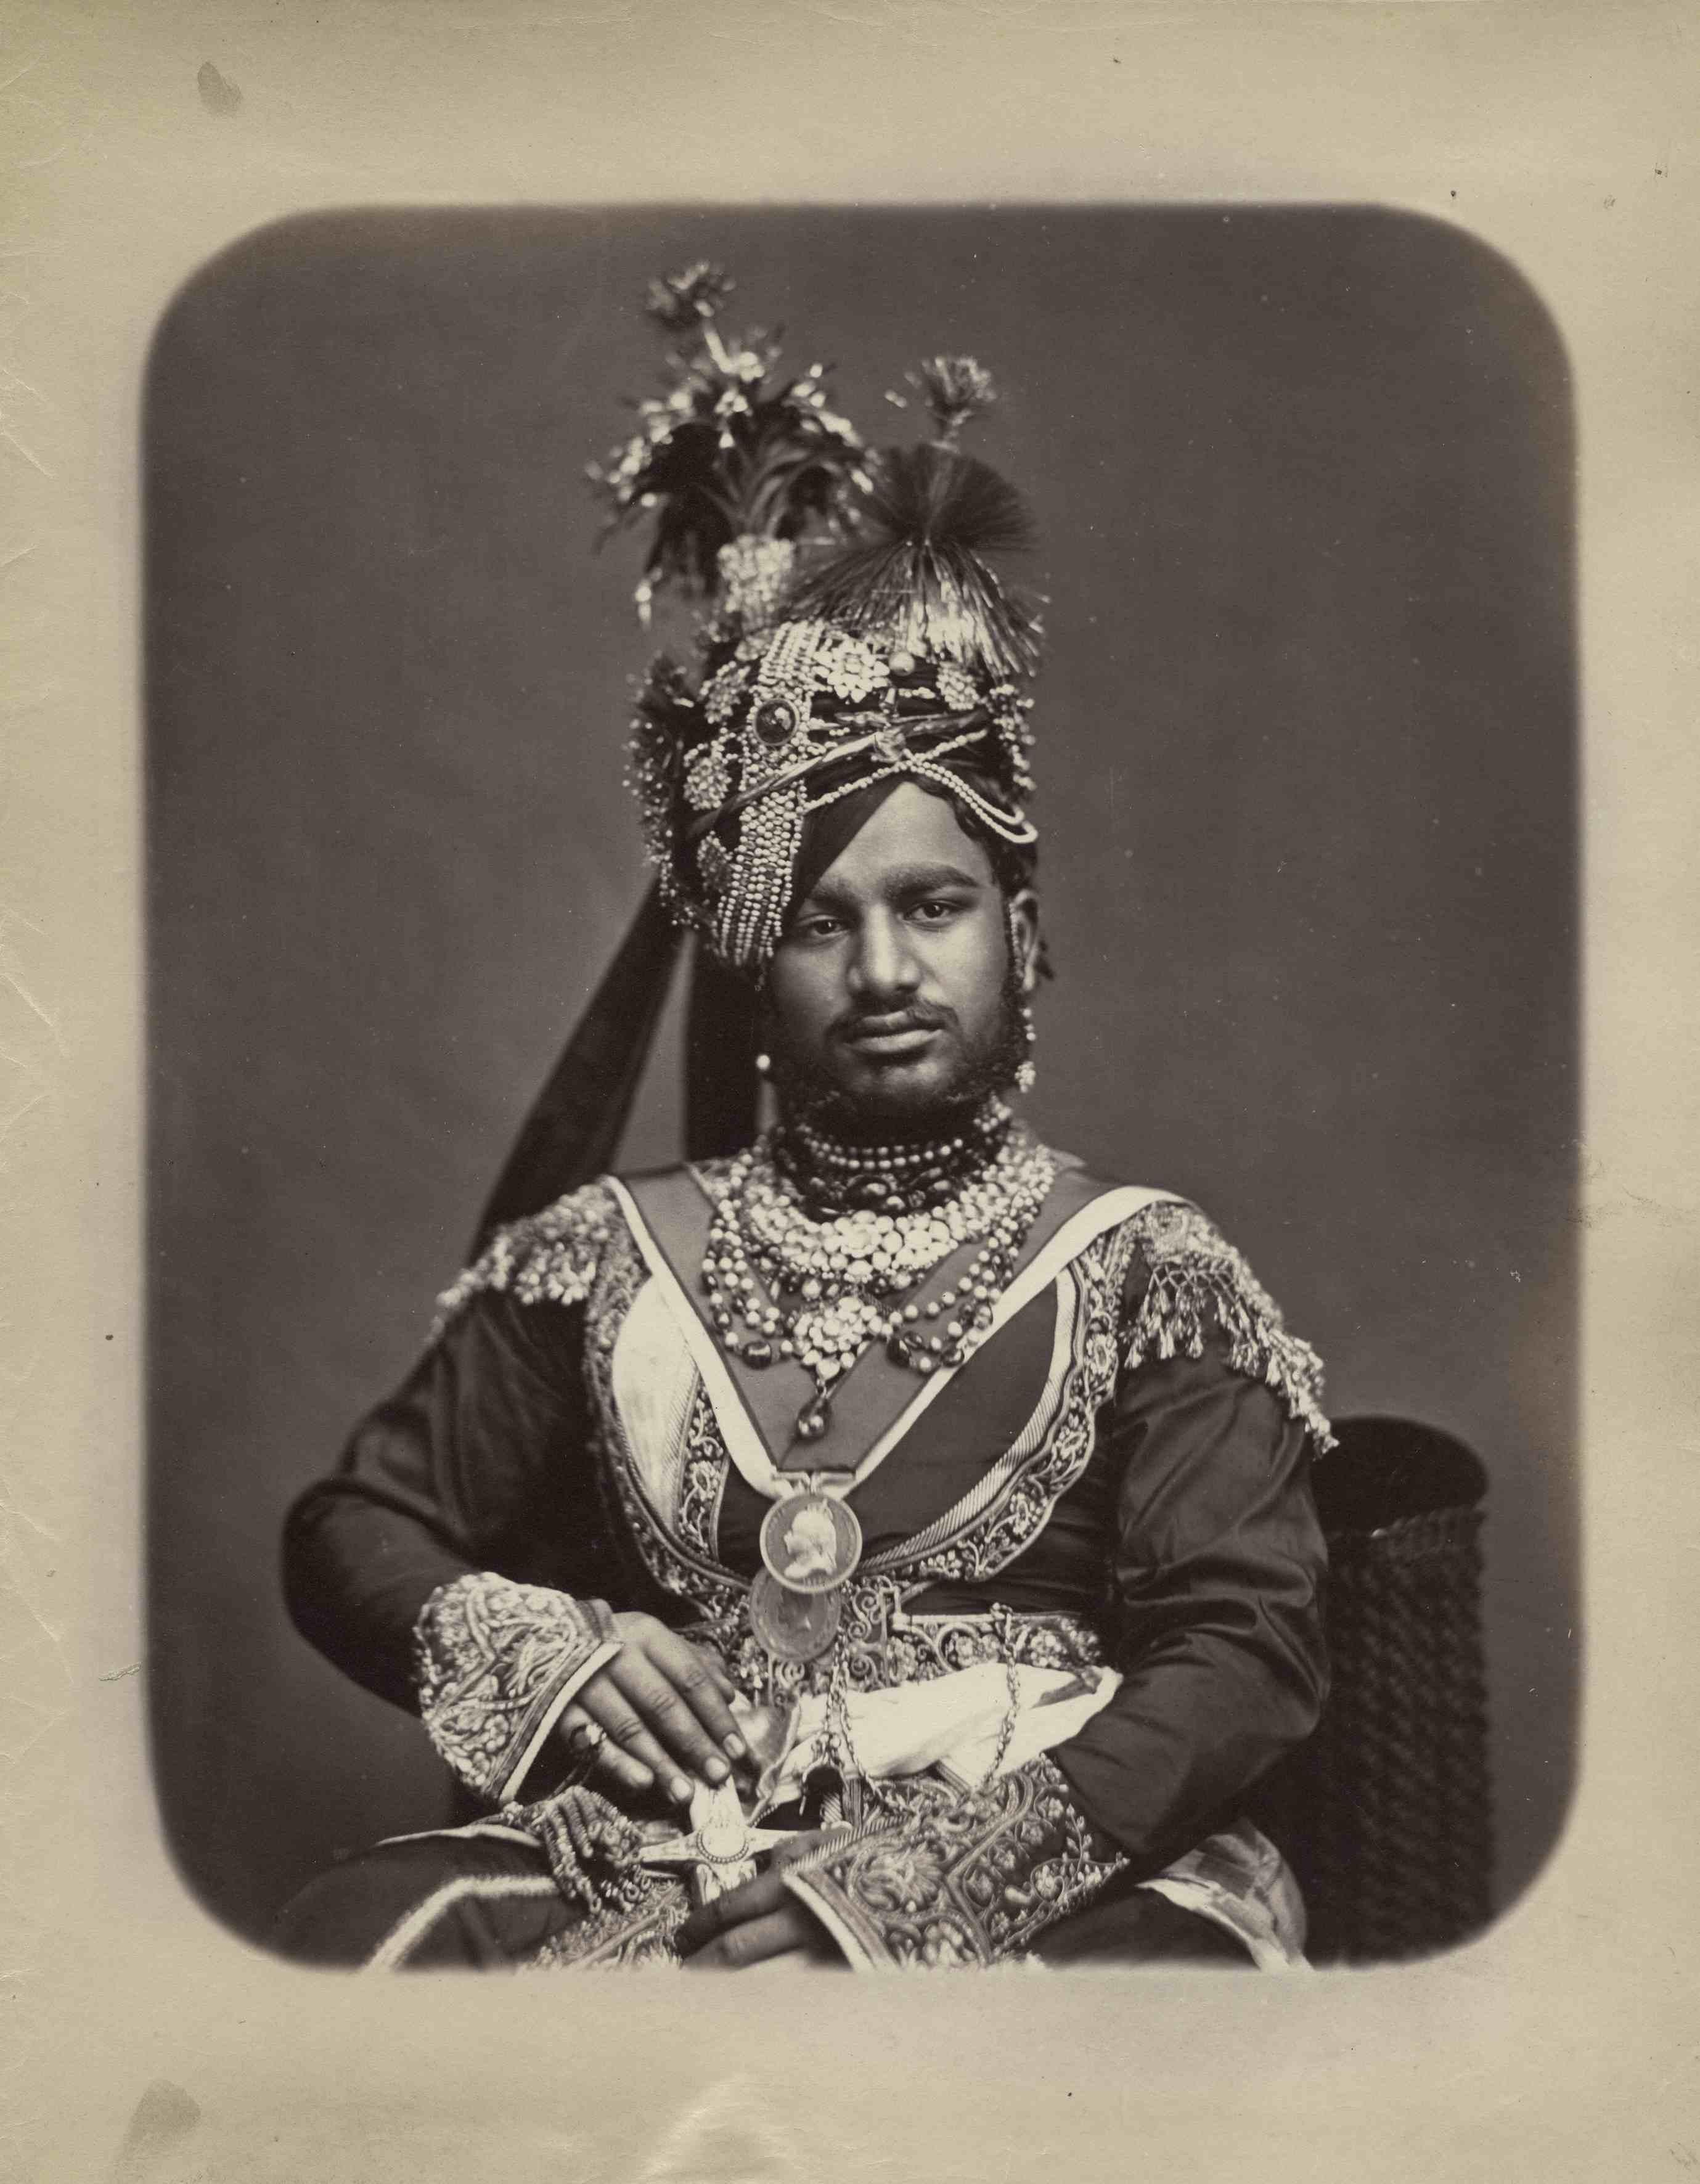 Samuel Bourne - 'Maharaja of Ratlam', India, 1870s, Albumen print